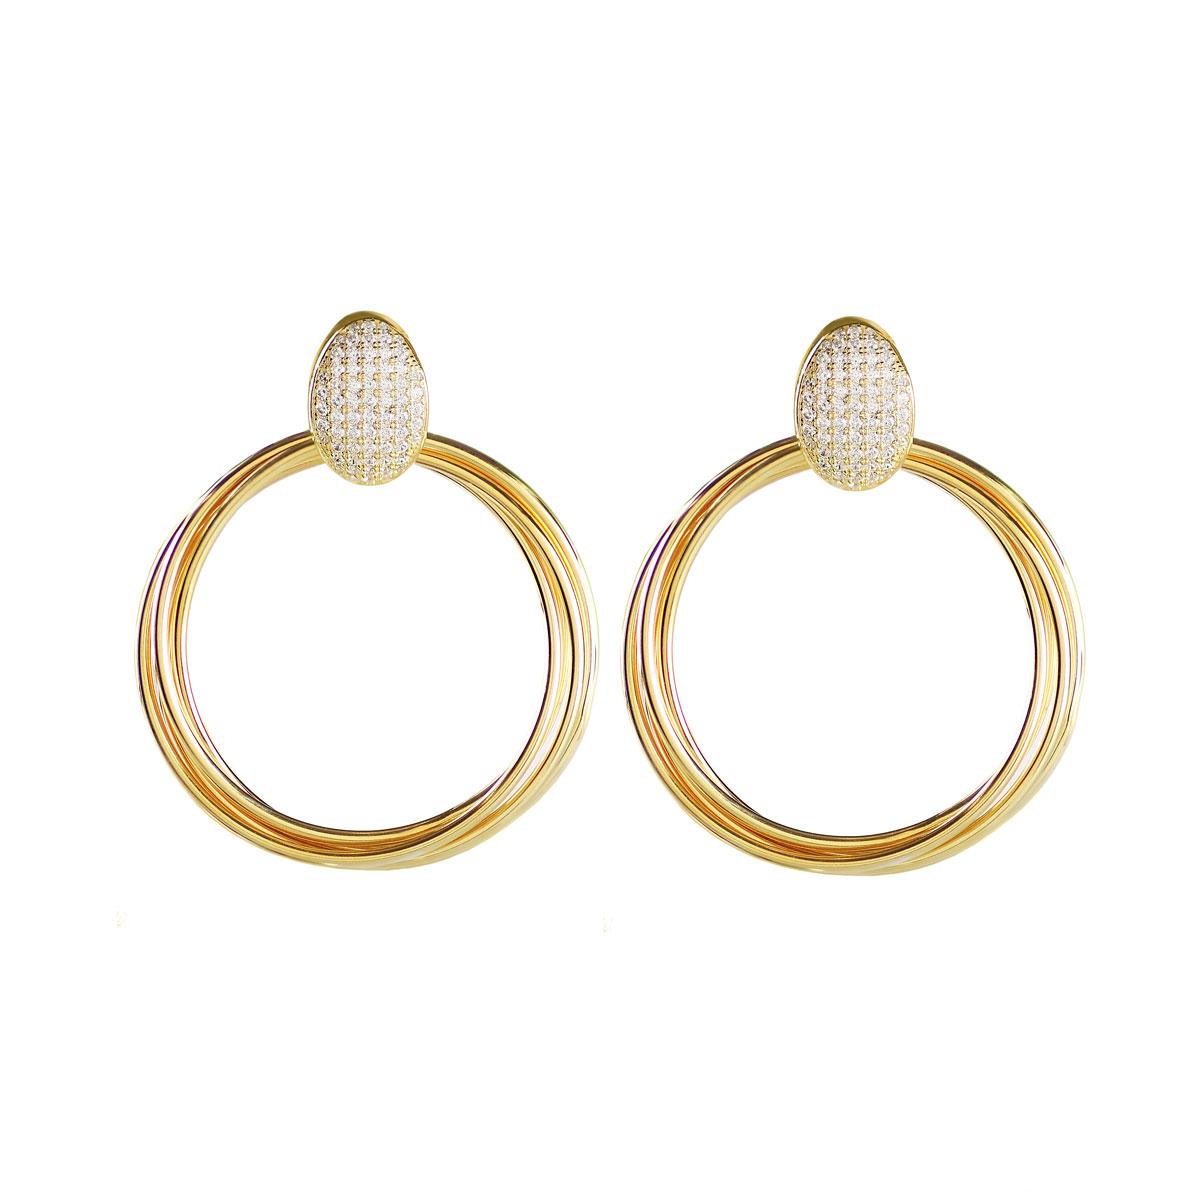 Cashs Ireland, Twist 18k Gold and Crystal Hoop Pierced Earrings